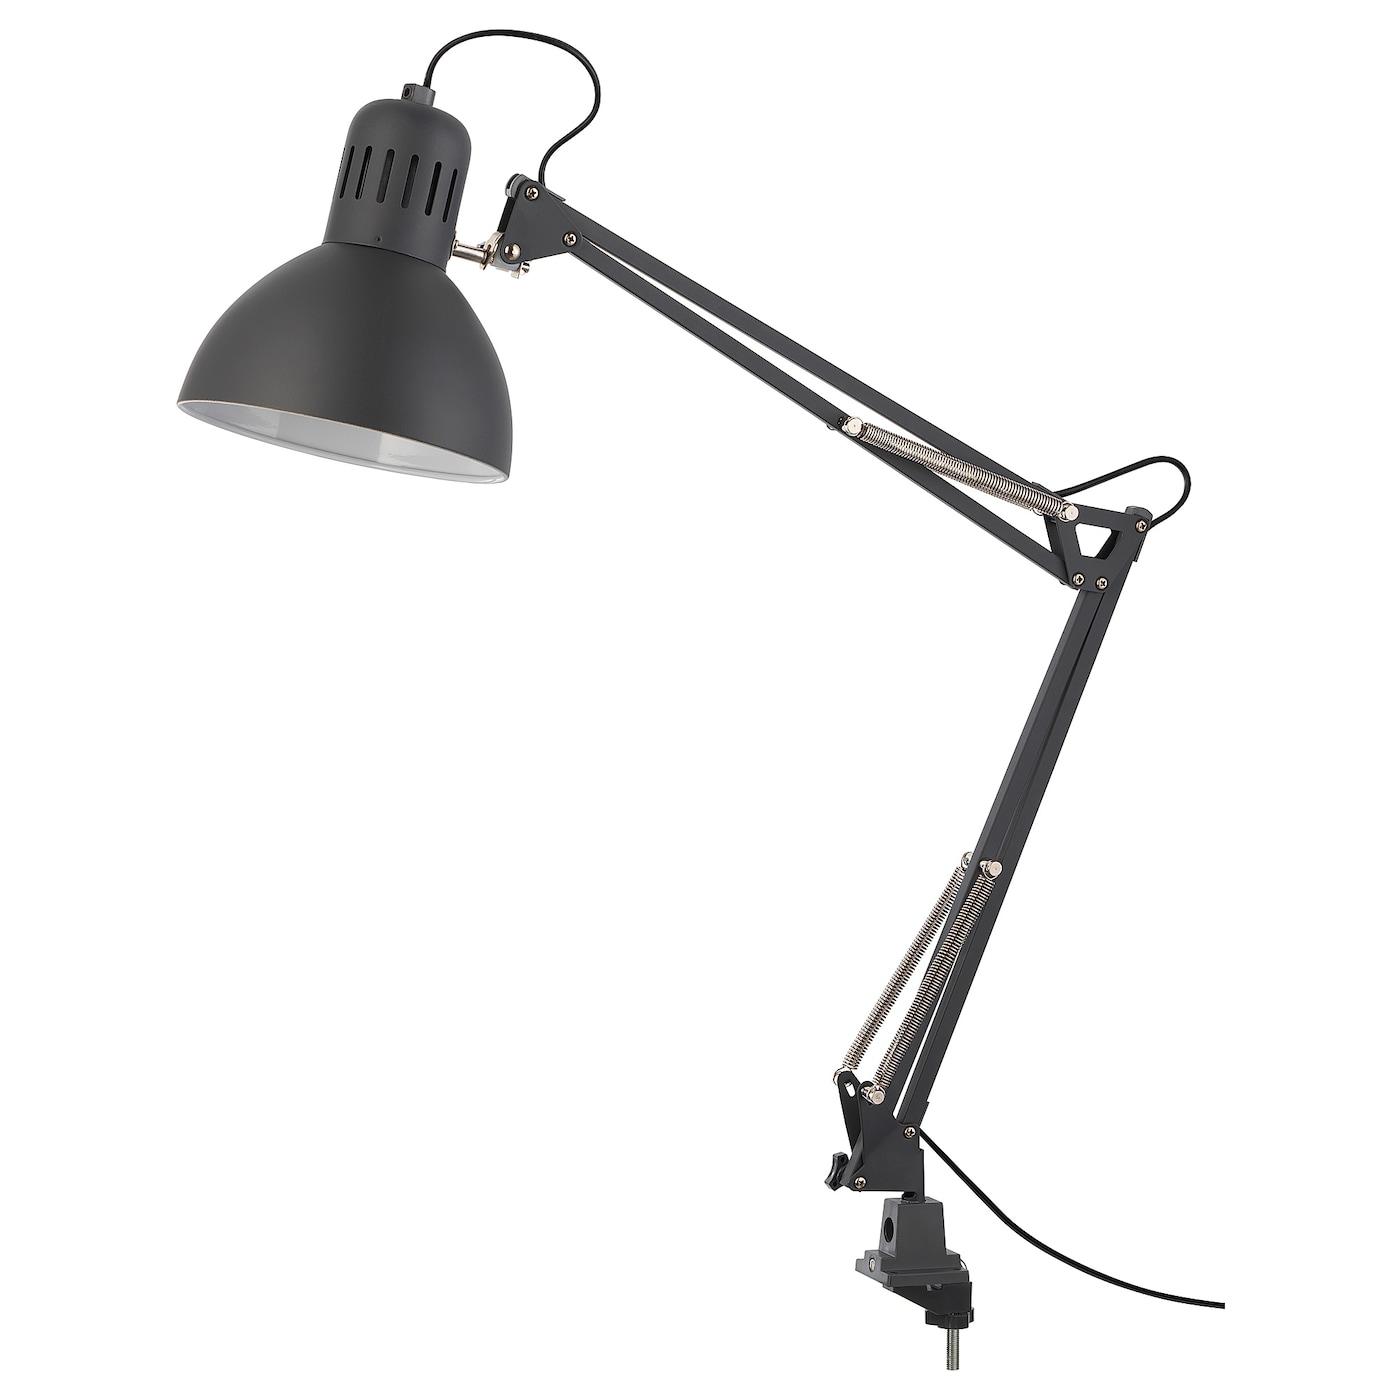 TERTIAL Work lamp with LED bulb - dark gray - IKEA